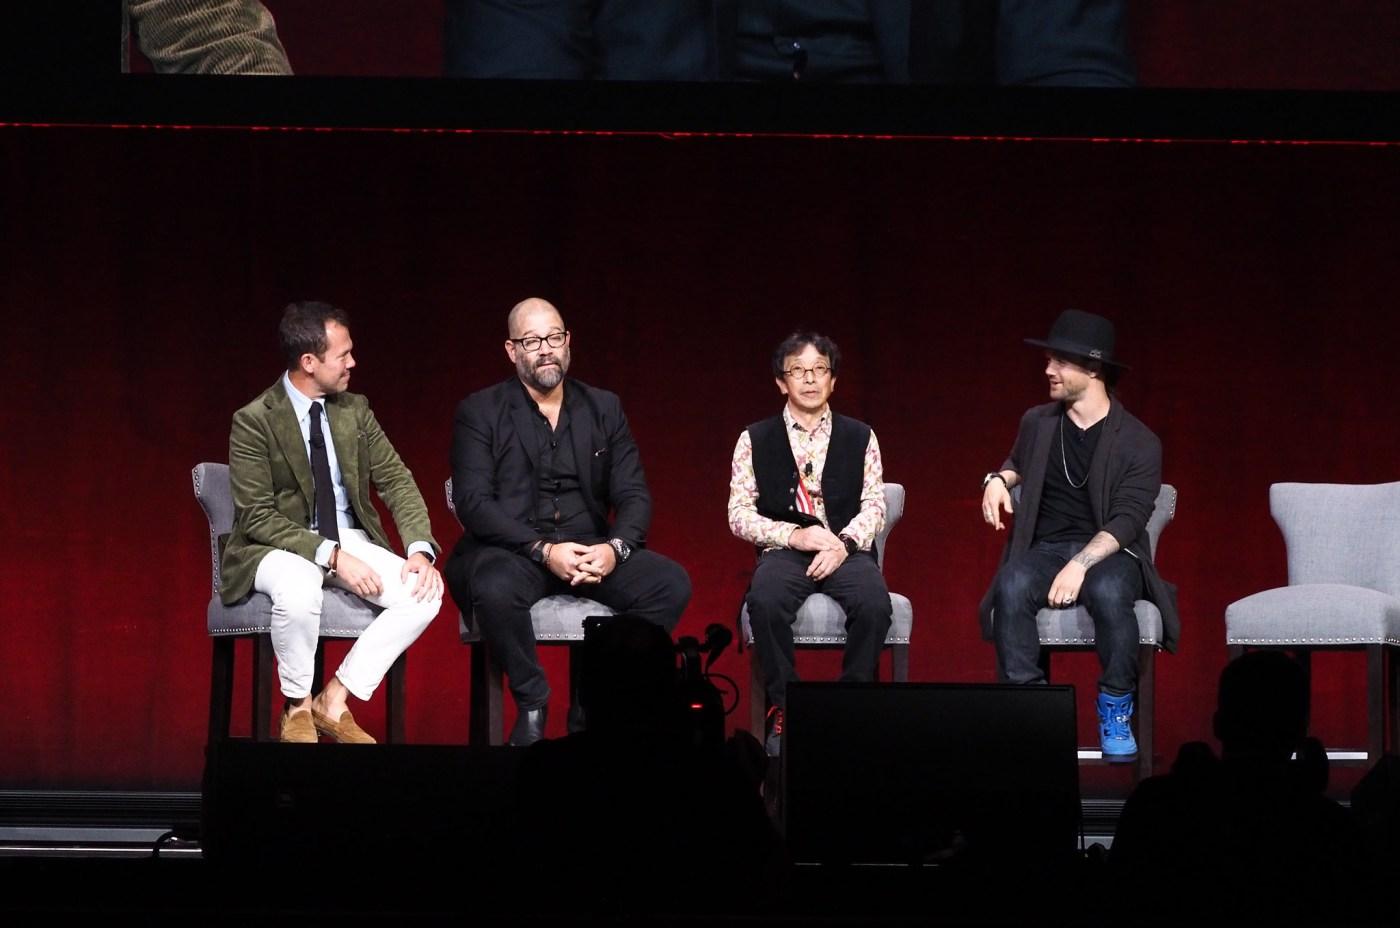 Left to right: Matt Hranek, Adam Craniotes, Kikuo Ibe, Louie Vito